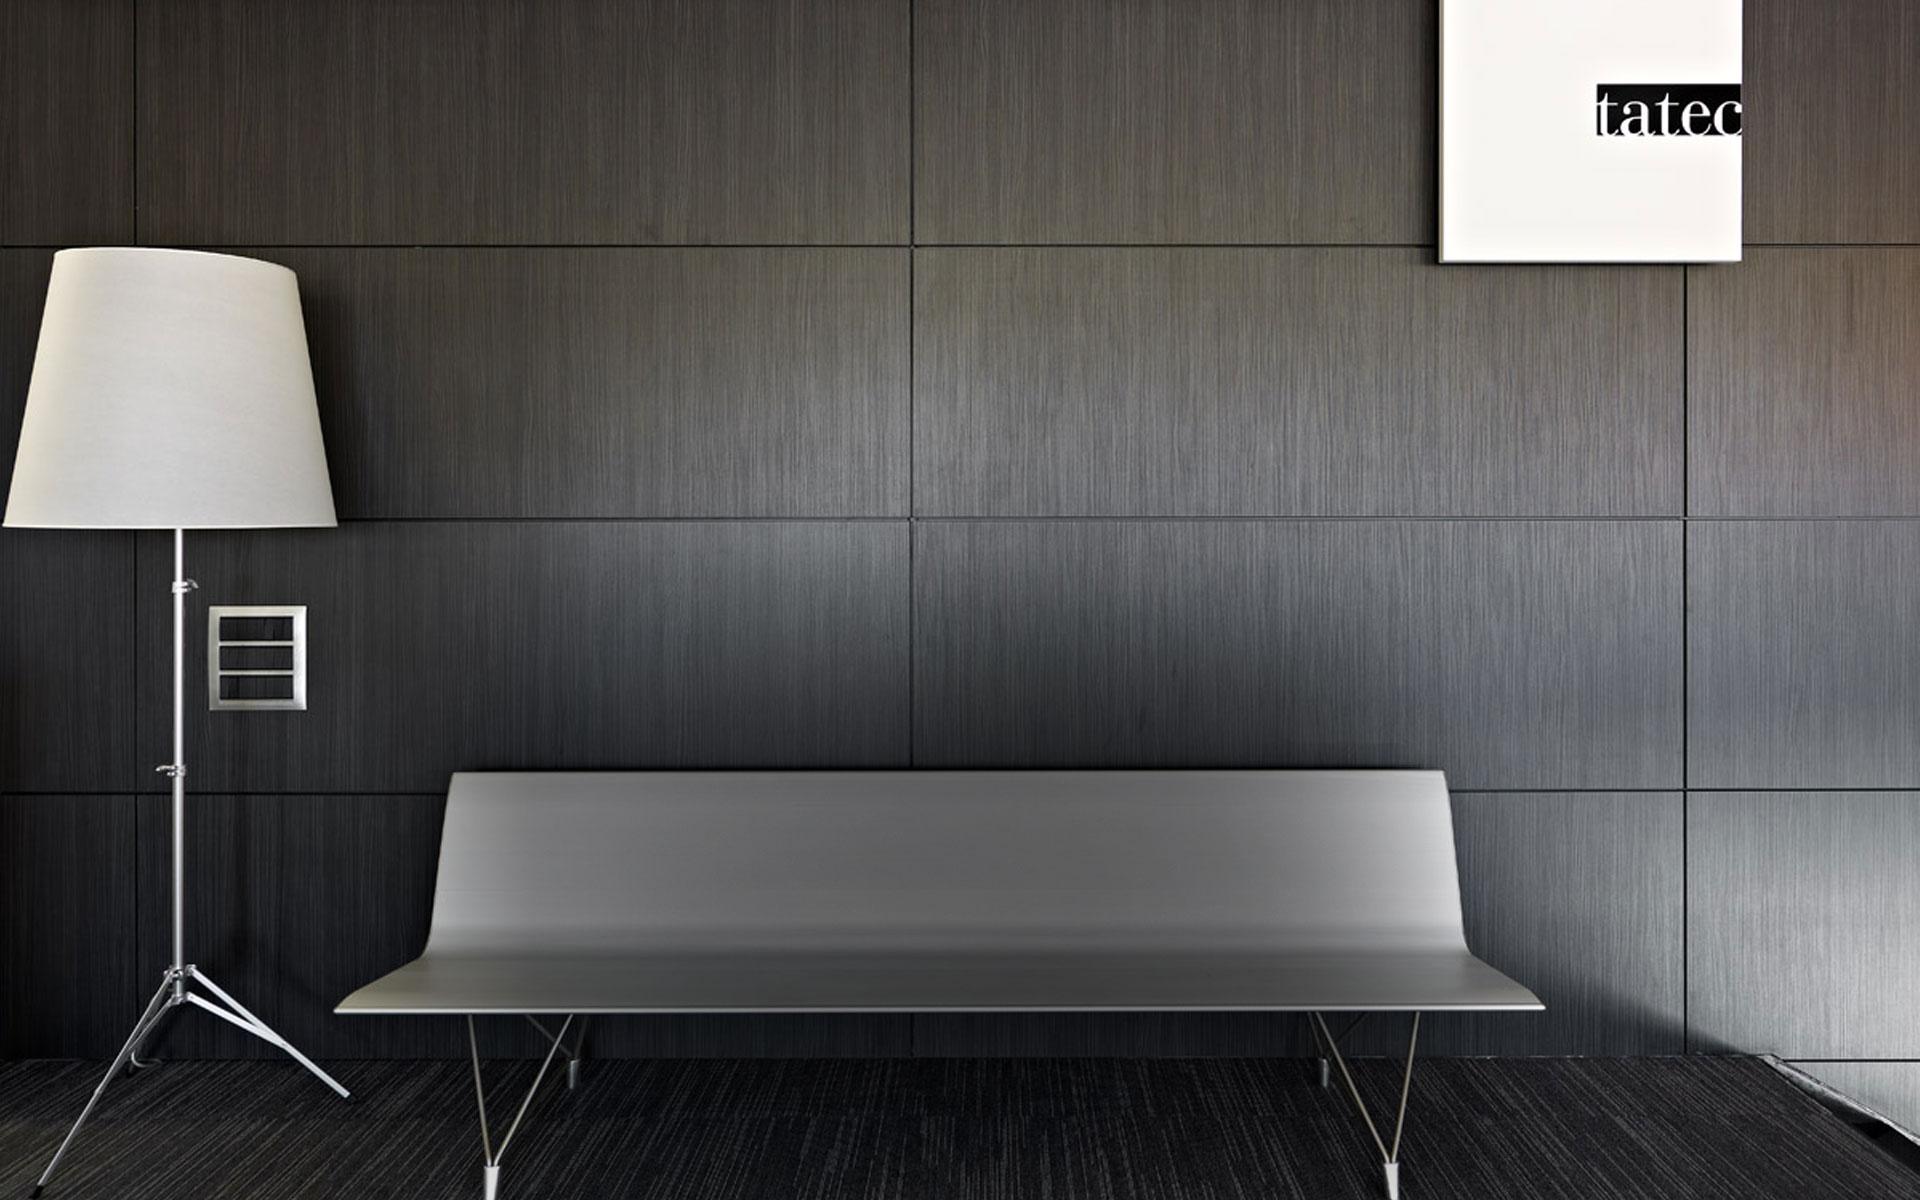 Tatec tabiques t cnicos fabricantes de tabique divisorio for Fabricantes de mobiliario de oficina